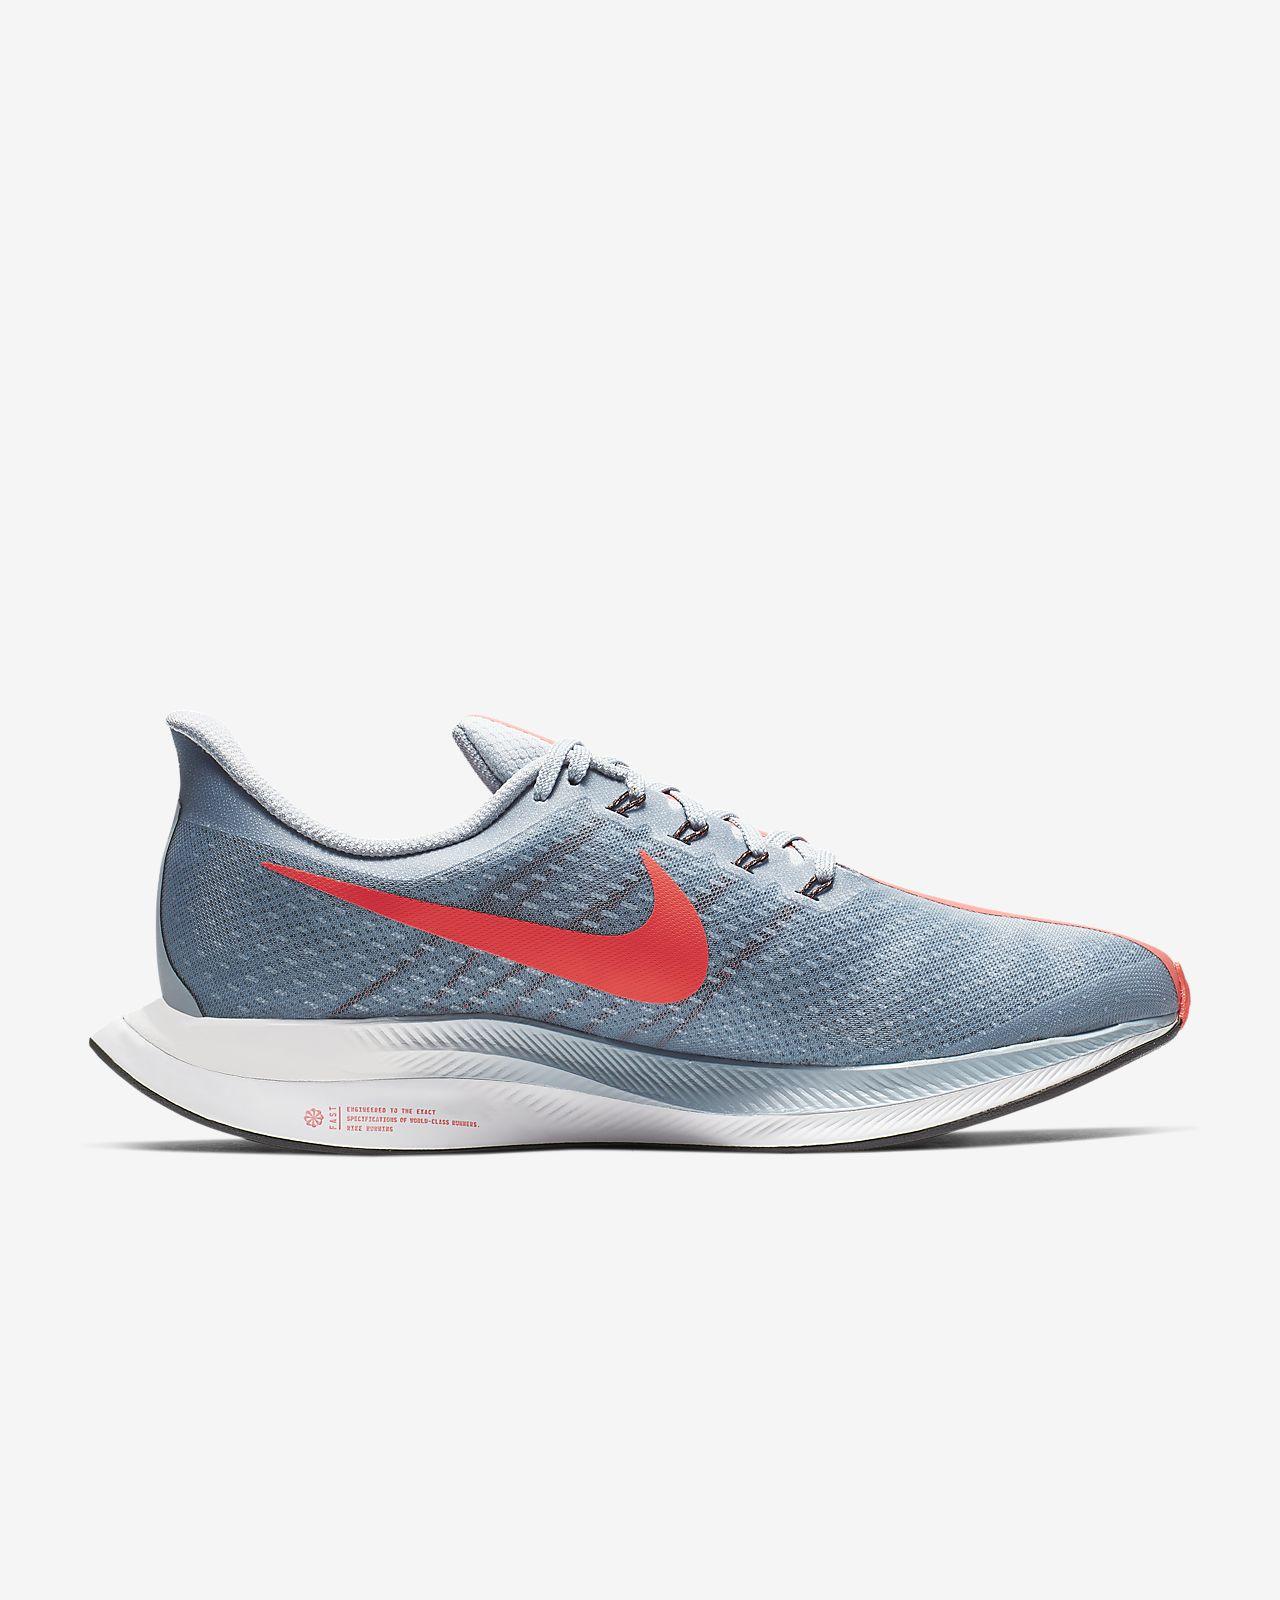 d1ab8271875a9 Nike Zoom Pegasus Turbo Men's Running Shoe. Nike.com MY